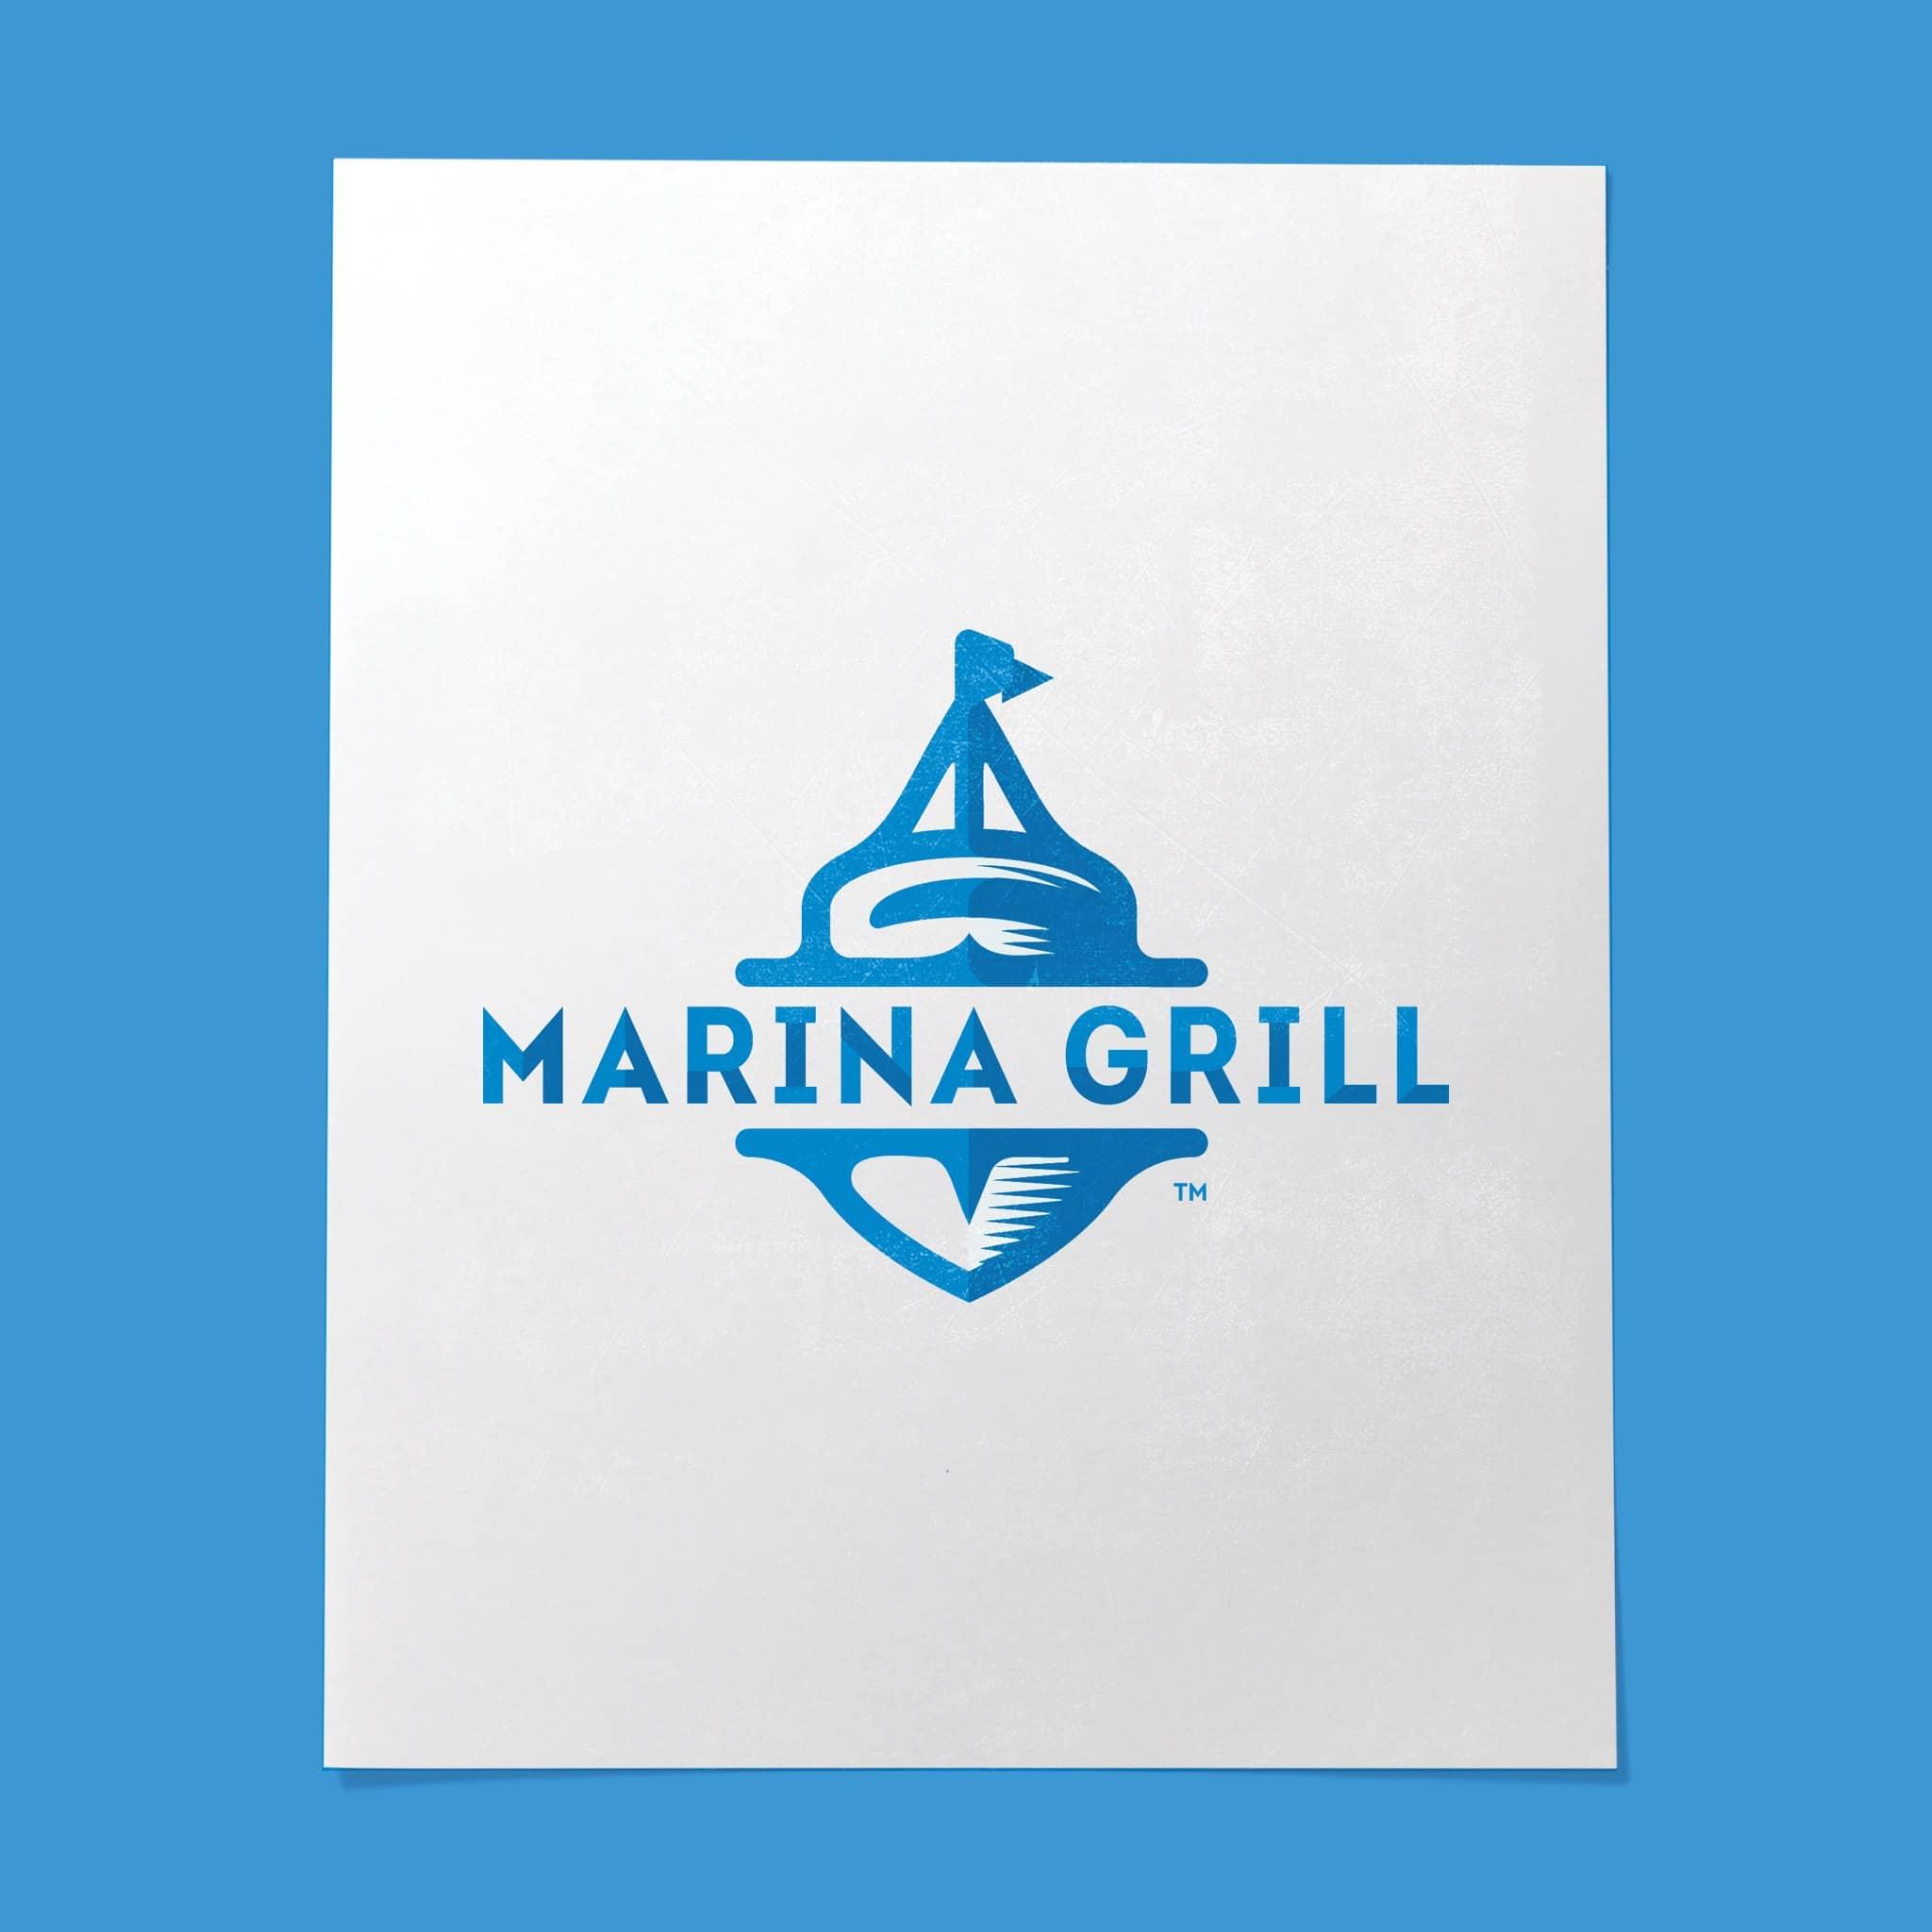 Marina Grill Logo Design by Brand Engine